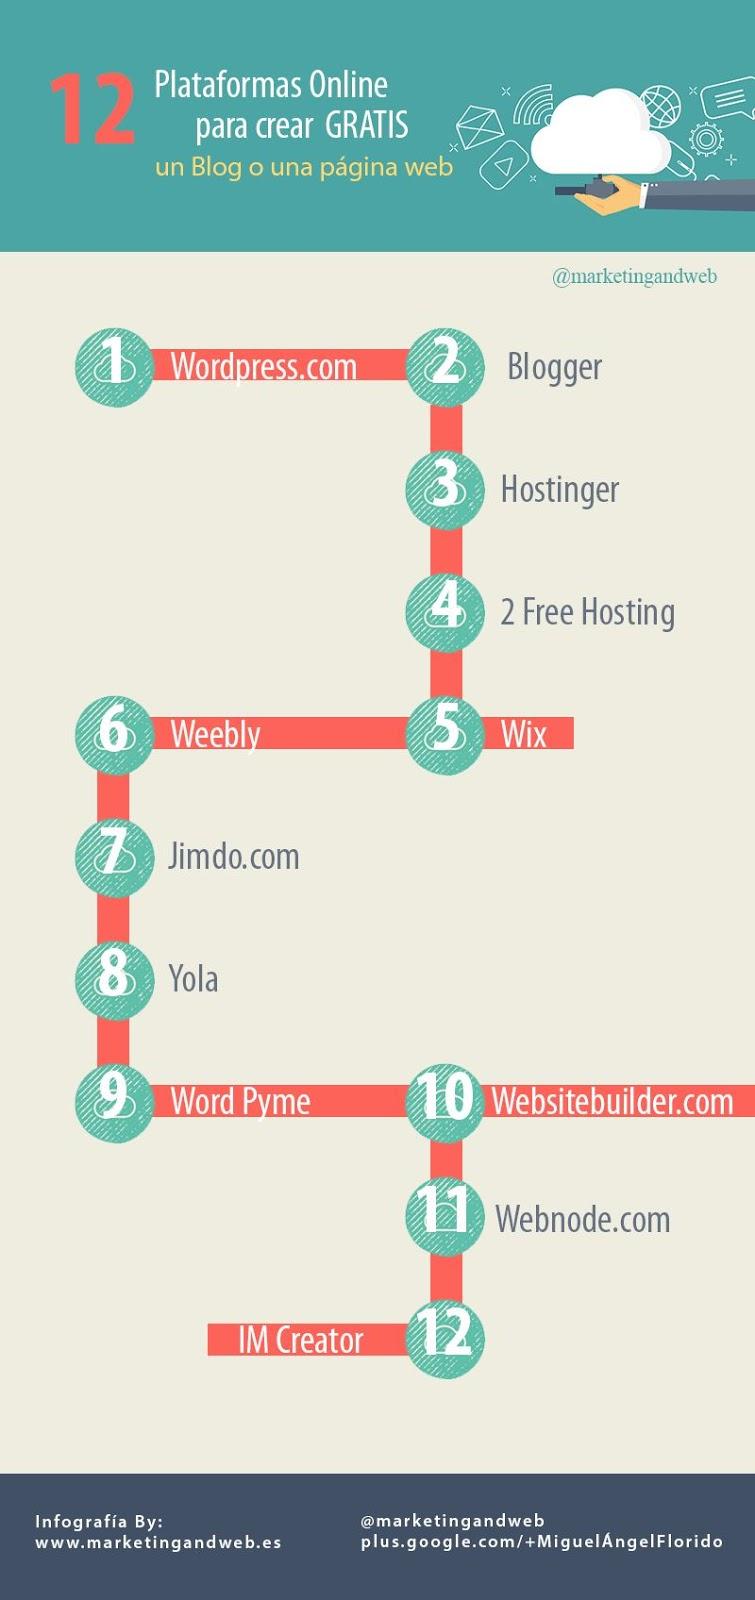 10 Plataformas Para Crear Paginas Web o Blog Gratis